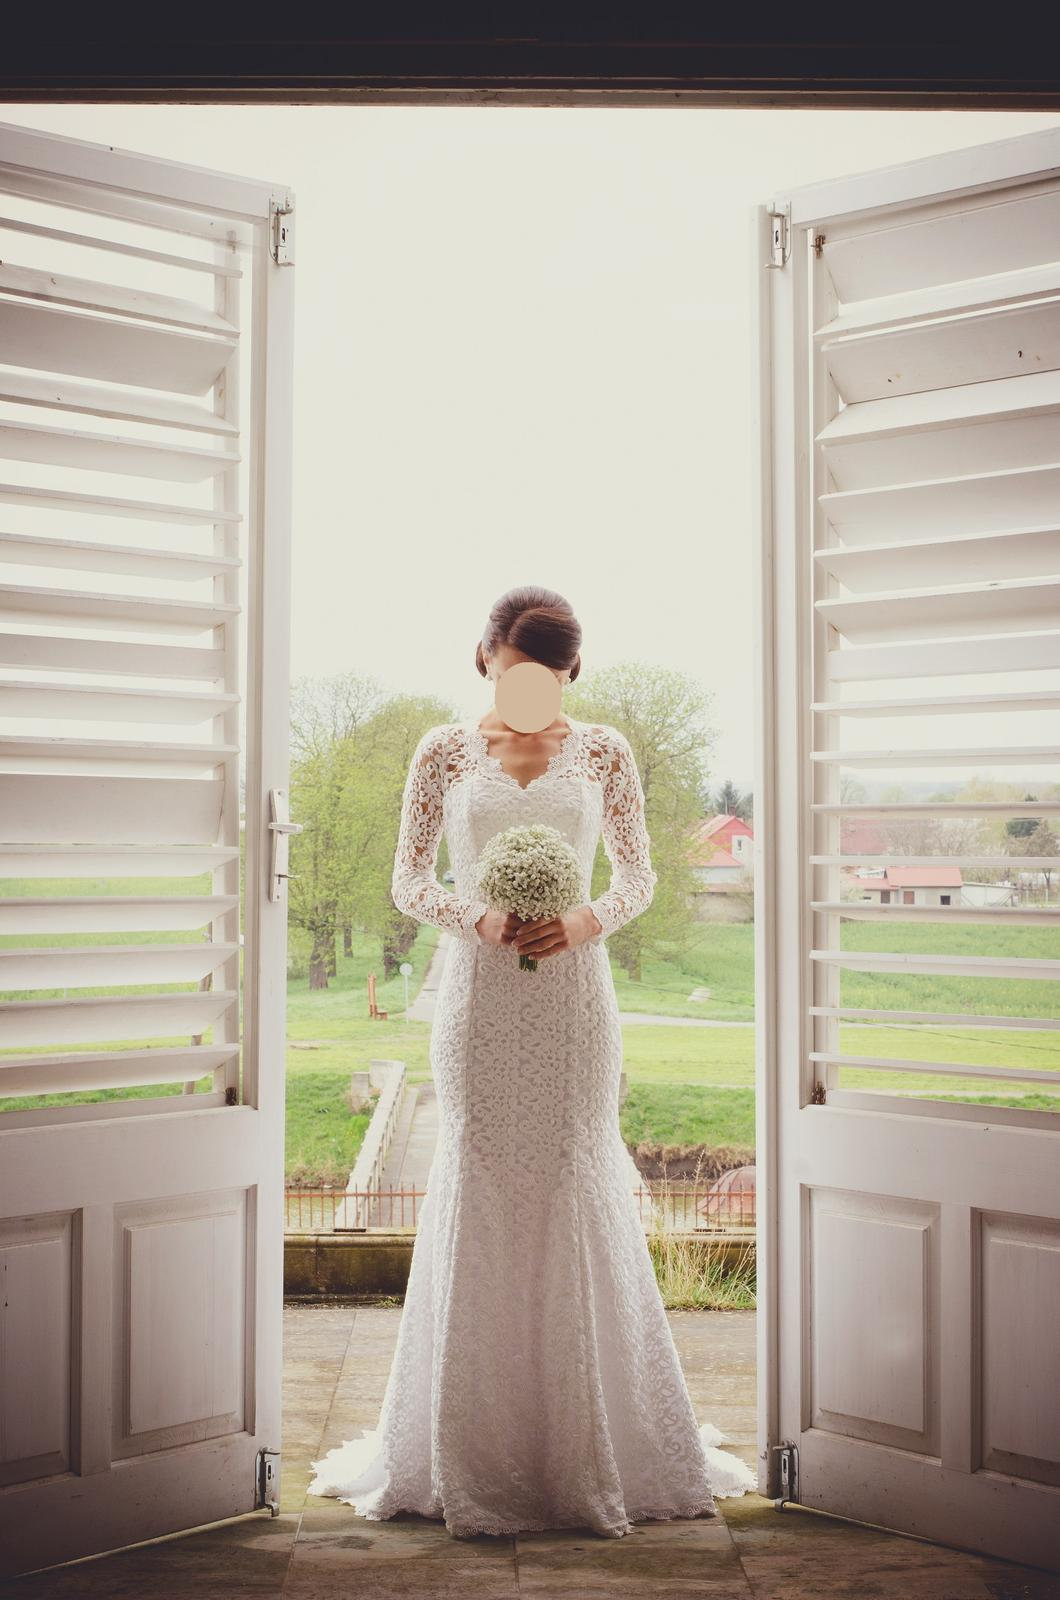 Luxusné krajkové šaty - Obrázok č. 2